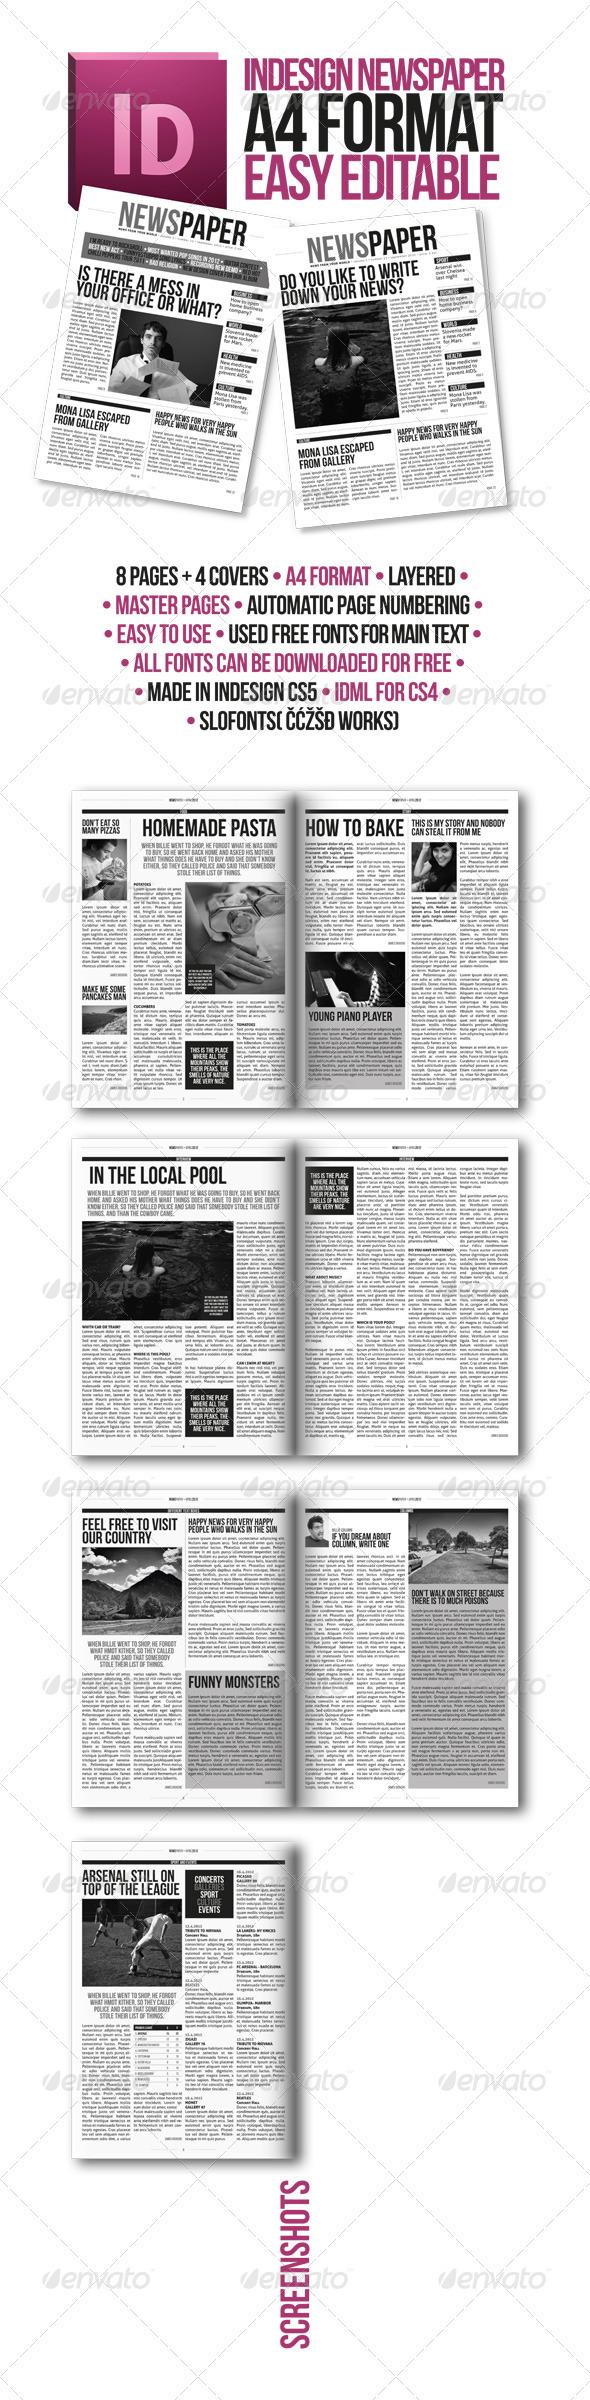 Free Editable Newspaper Template Kenindlecomfortzone